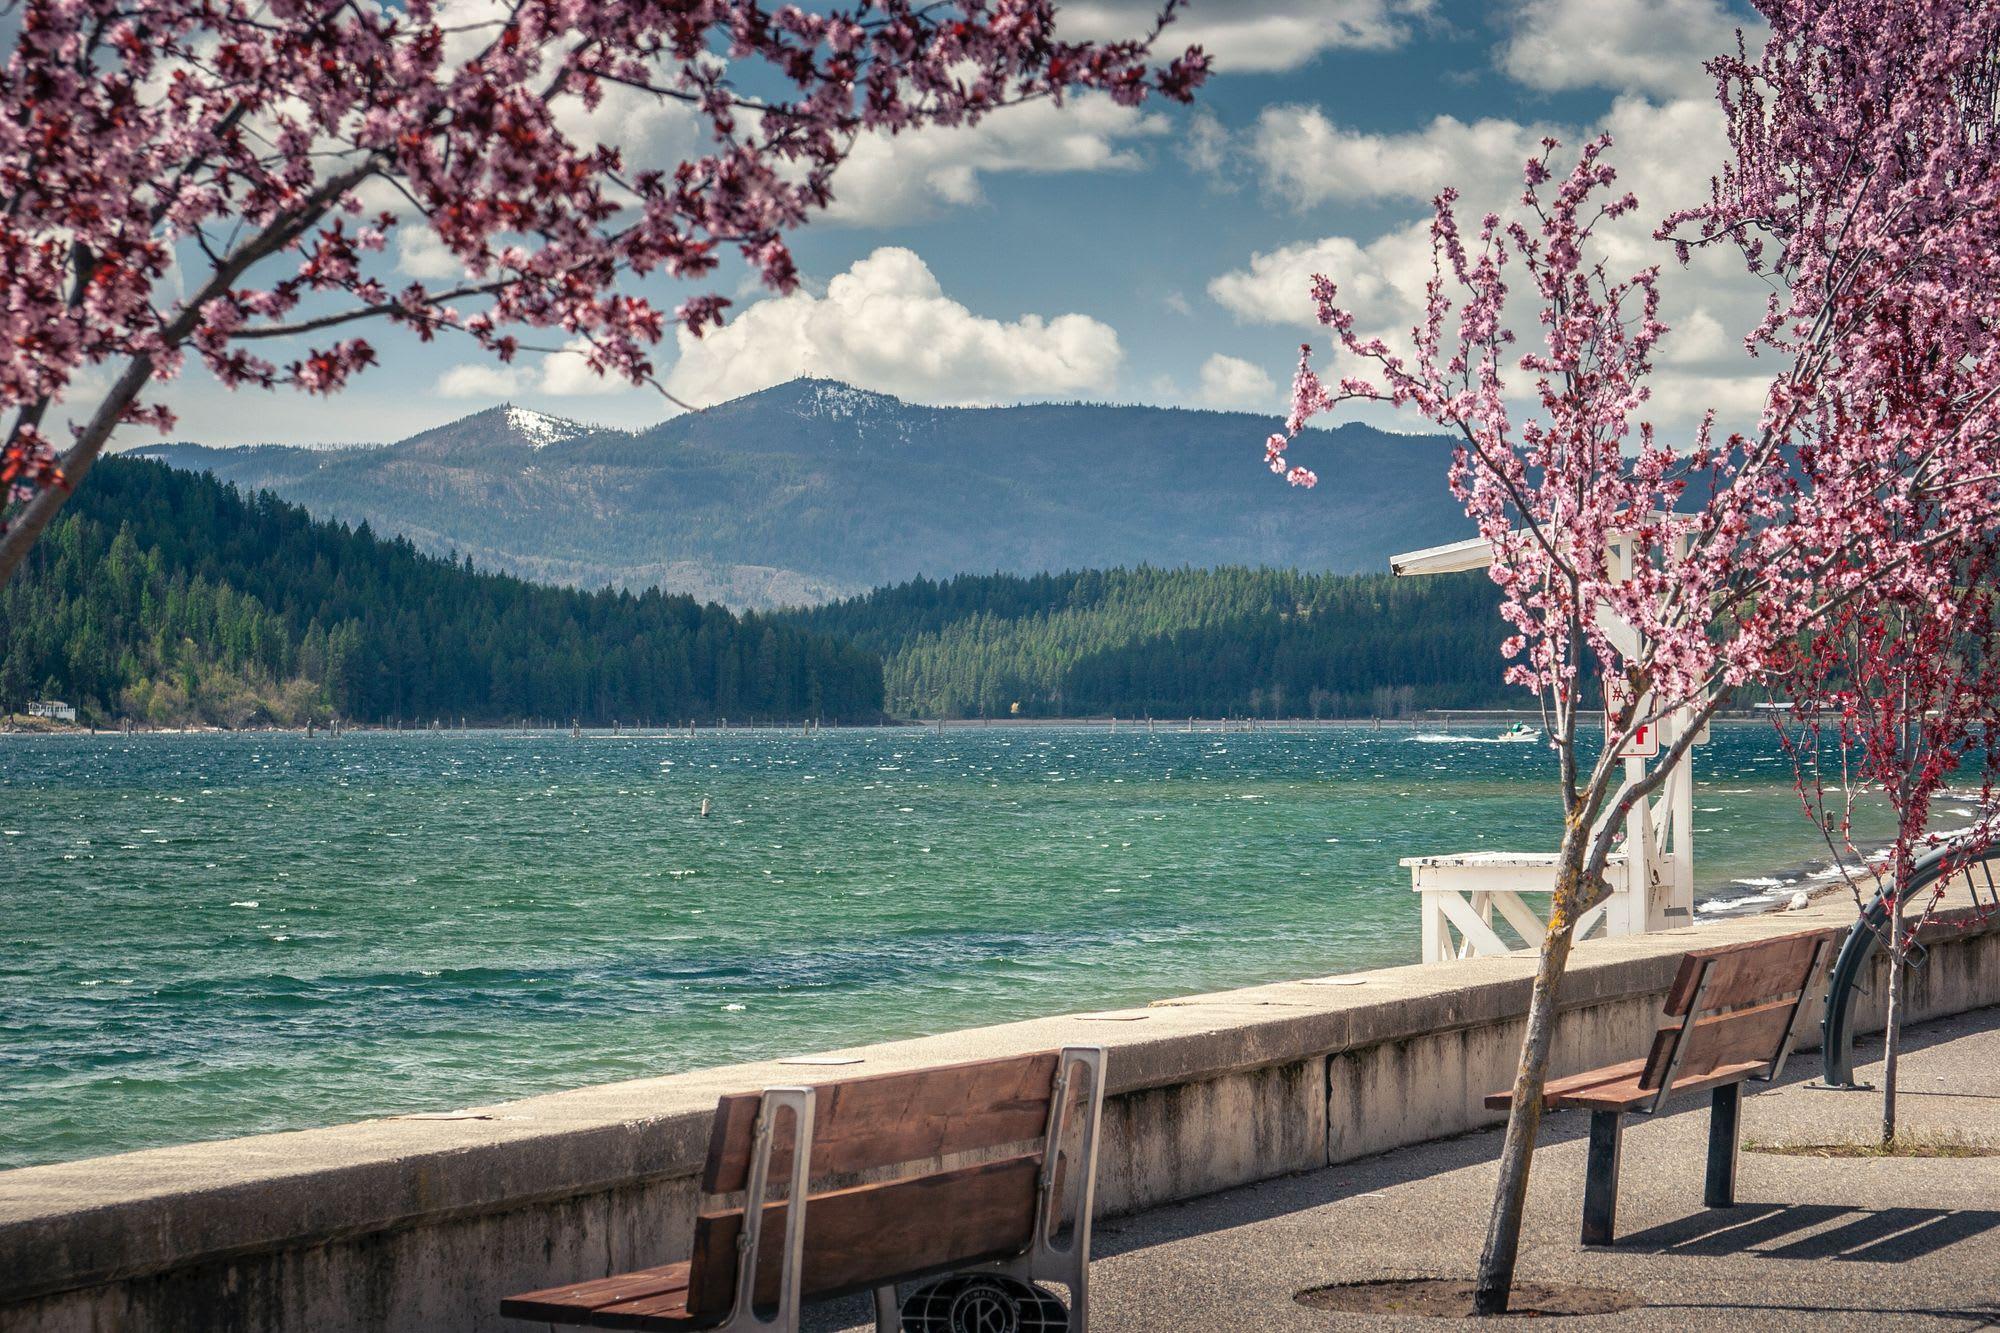 Background Image for Visualising Sakura (cherry-blossom)